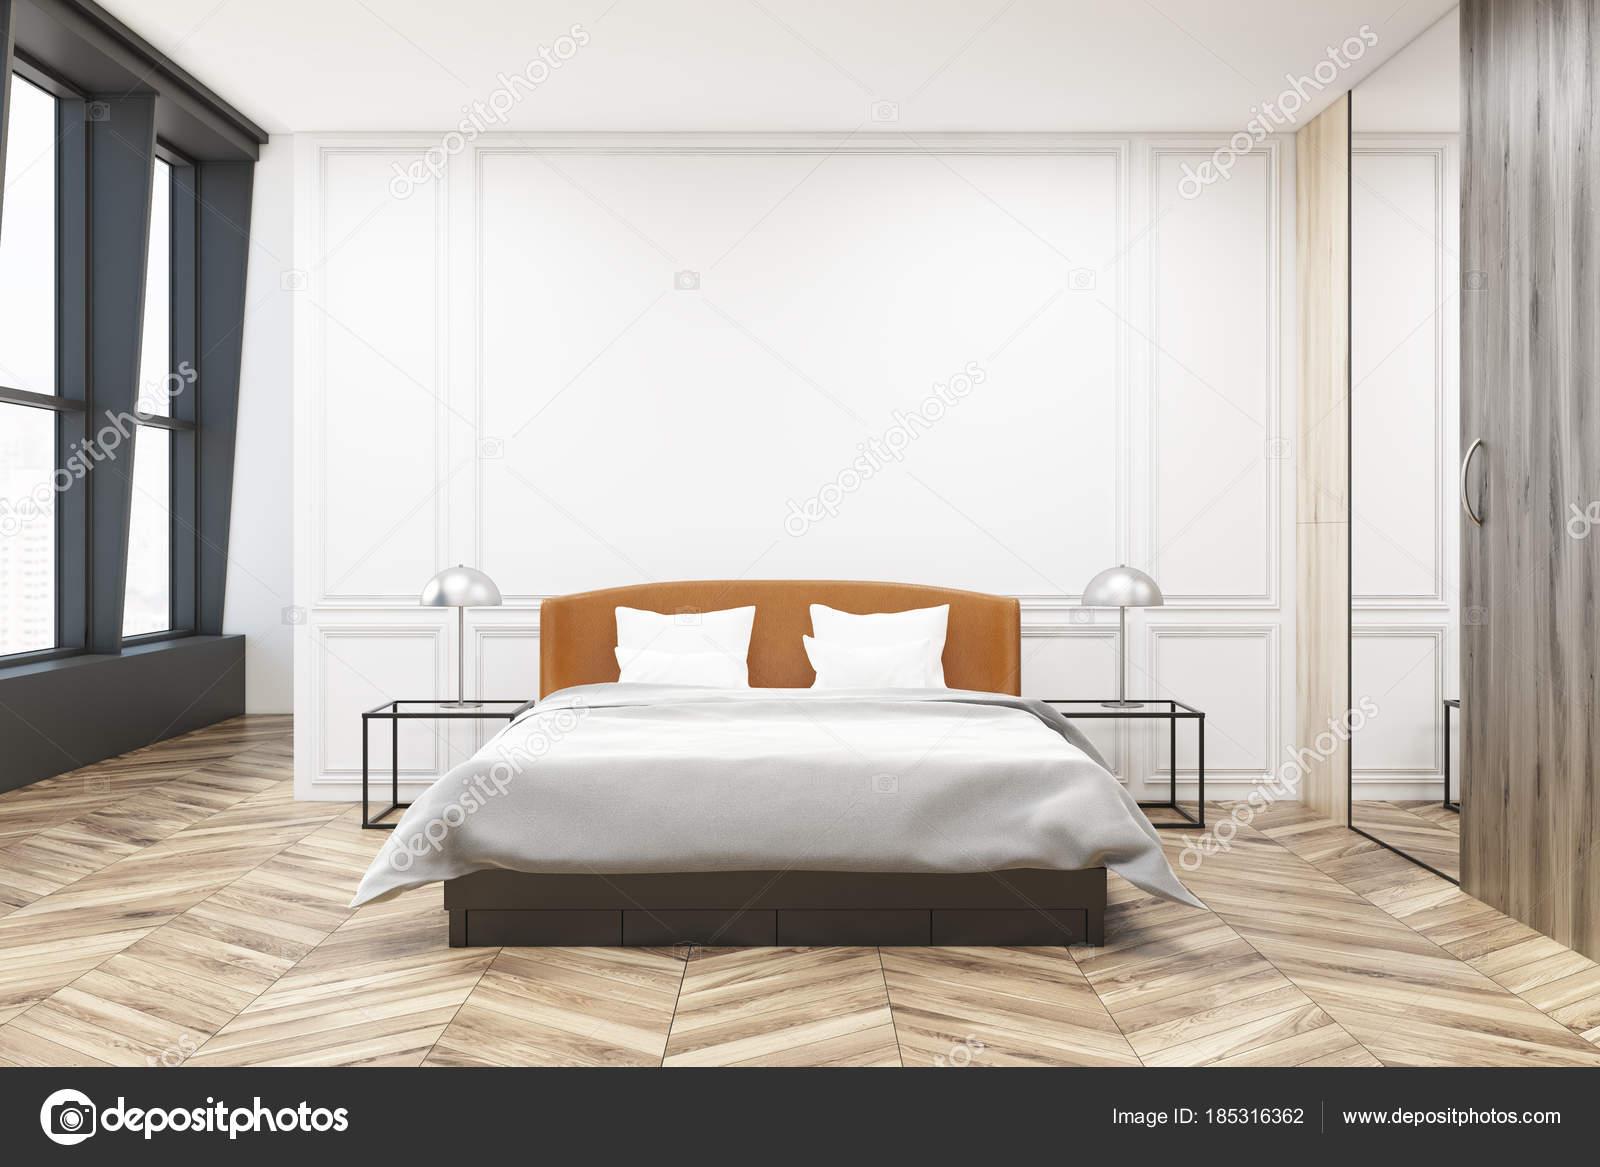 Slaapkamer Met Kledingkast : Stijlvolle slaapkamer interieur kledingkast u2014 stockfoto